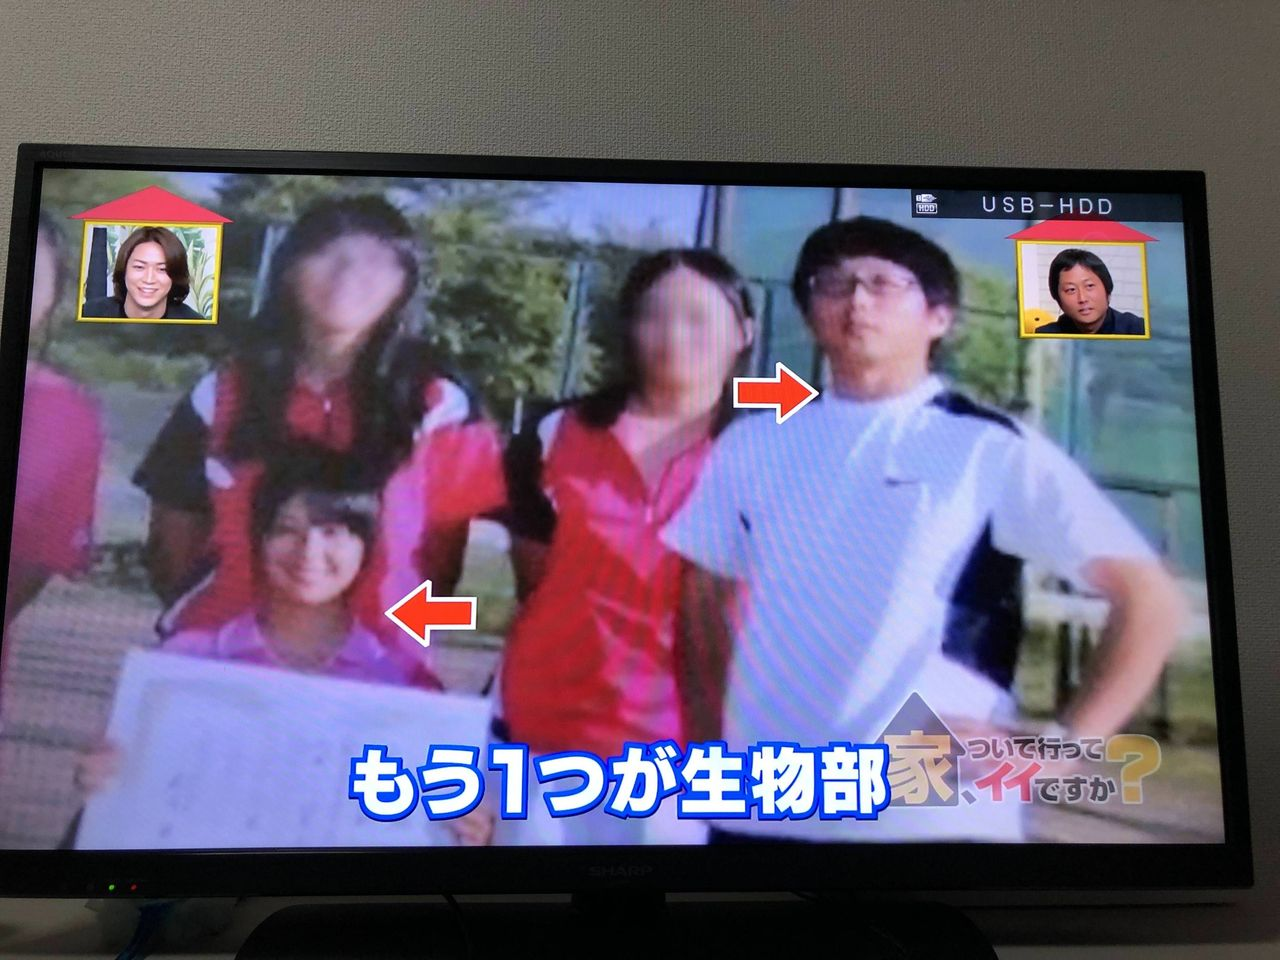 https://livedoor.blogimg.jp/alienty/imgs/5/1/512a84f7.jpg